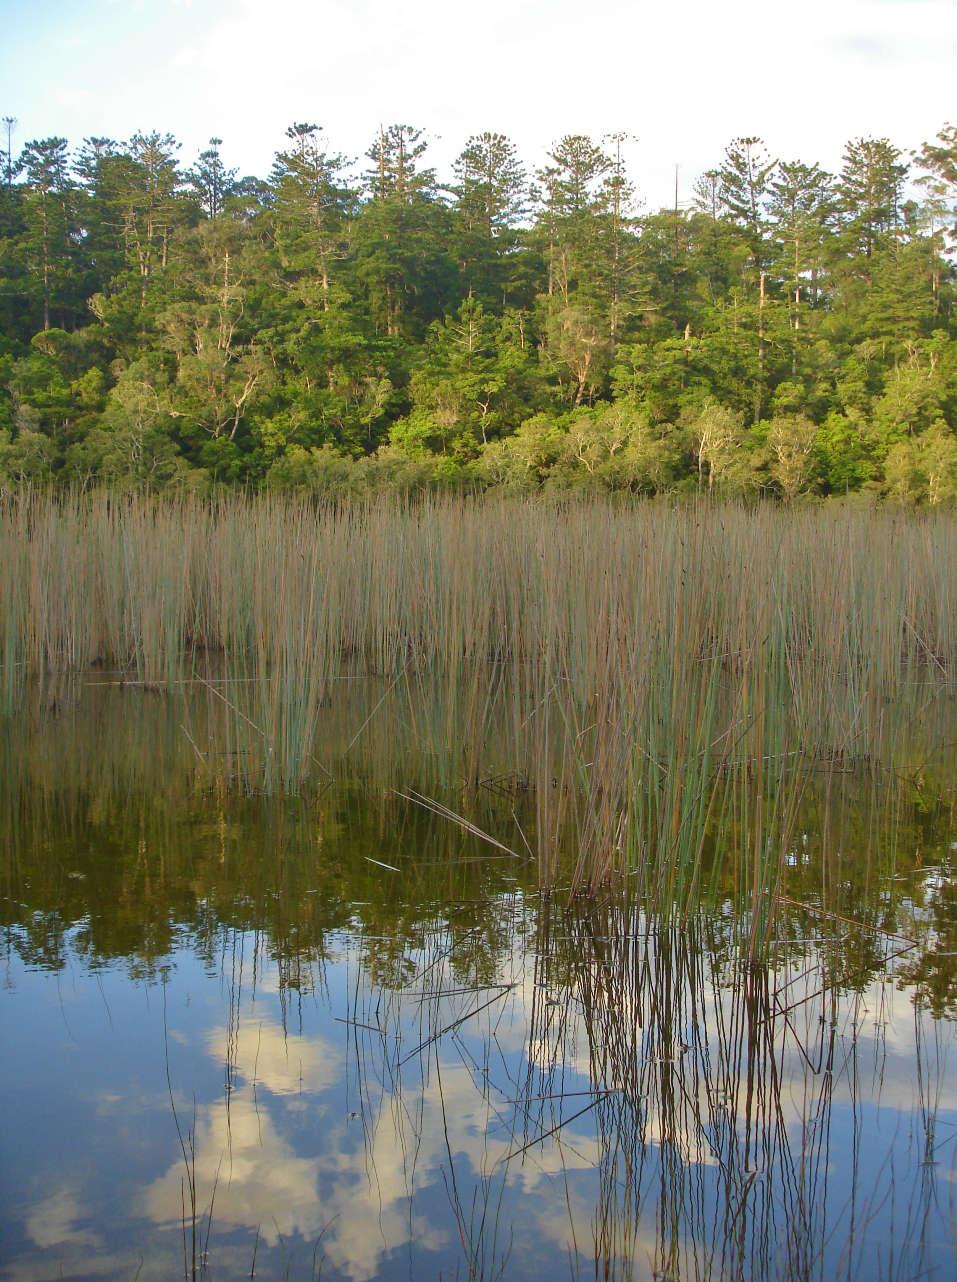 Swamp on Fraser Island